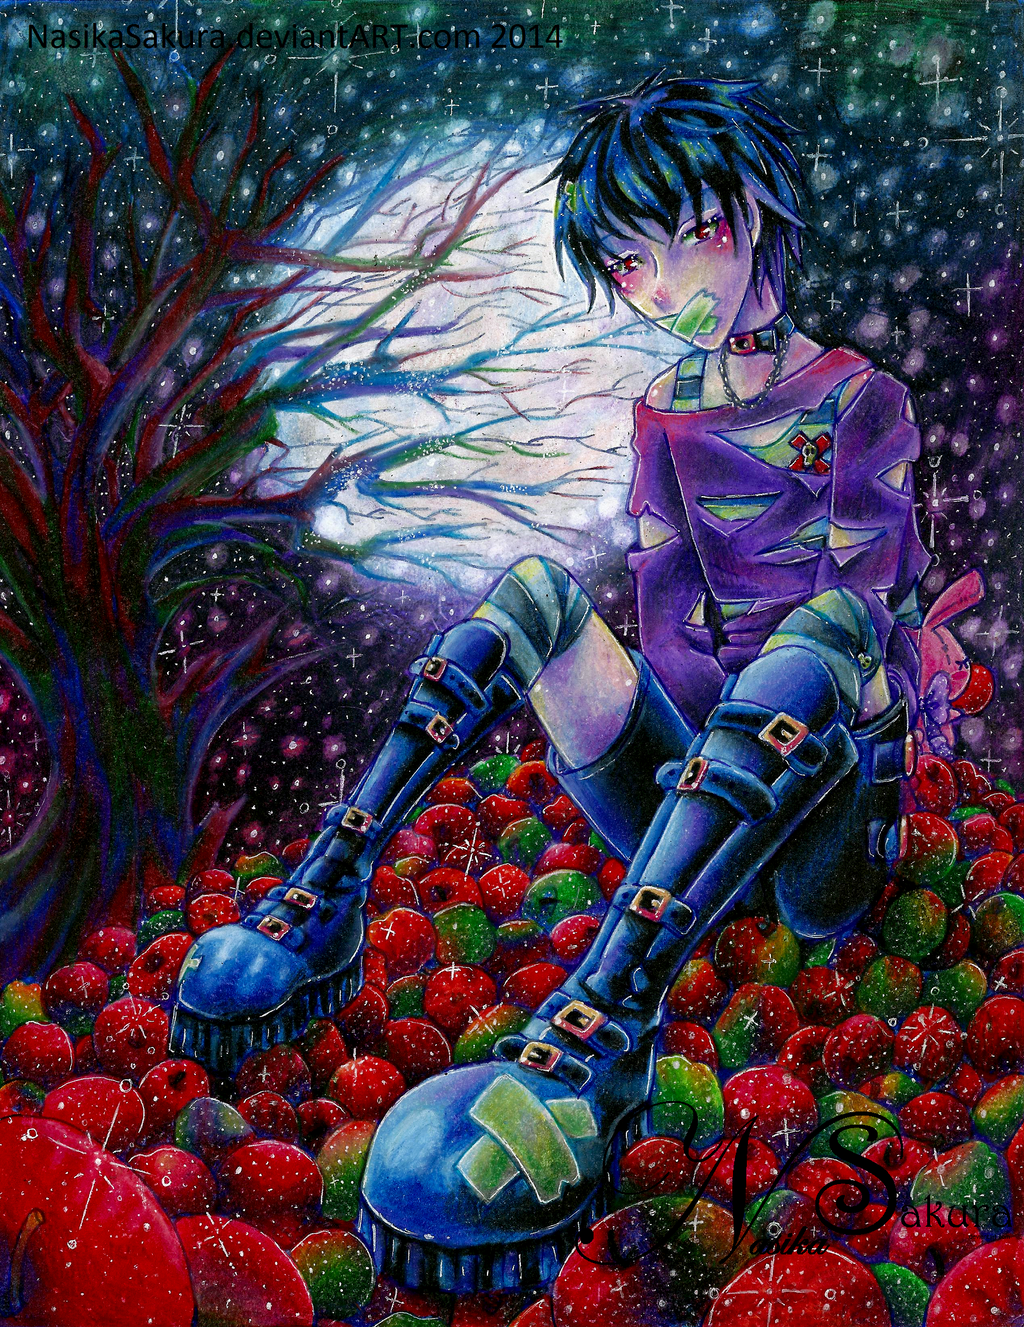 Rem untitled by NasikaSakura